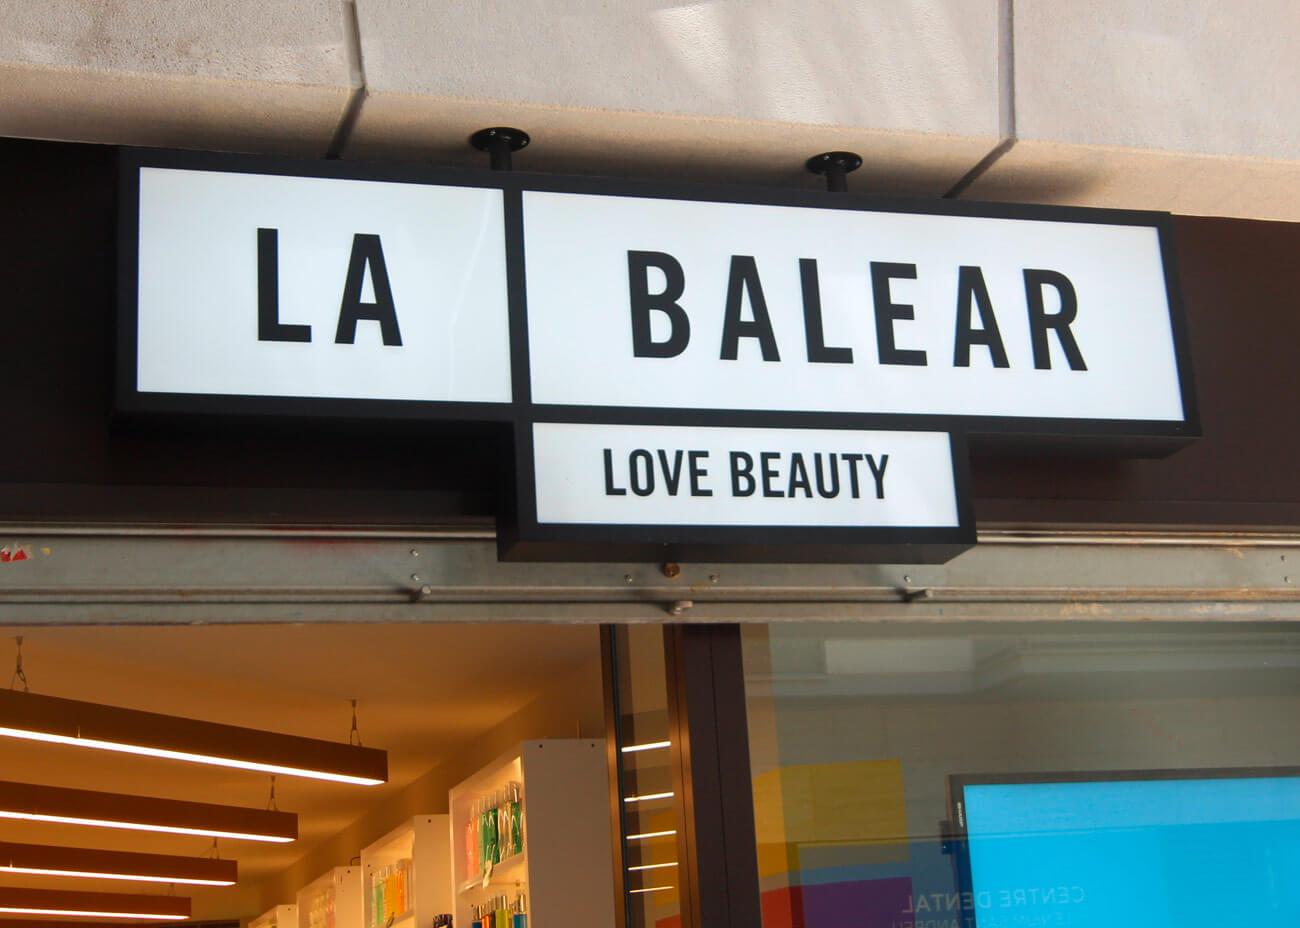 labalear-img01-caad-retail-design-barcelona